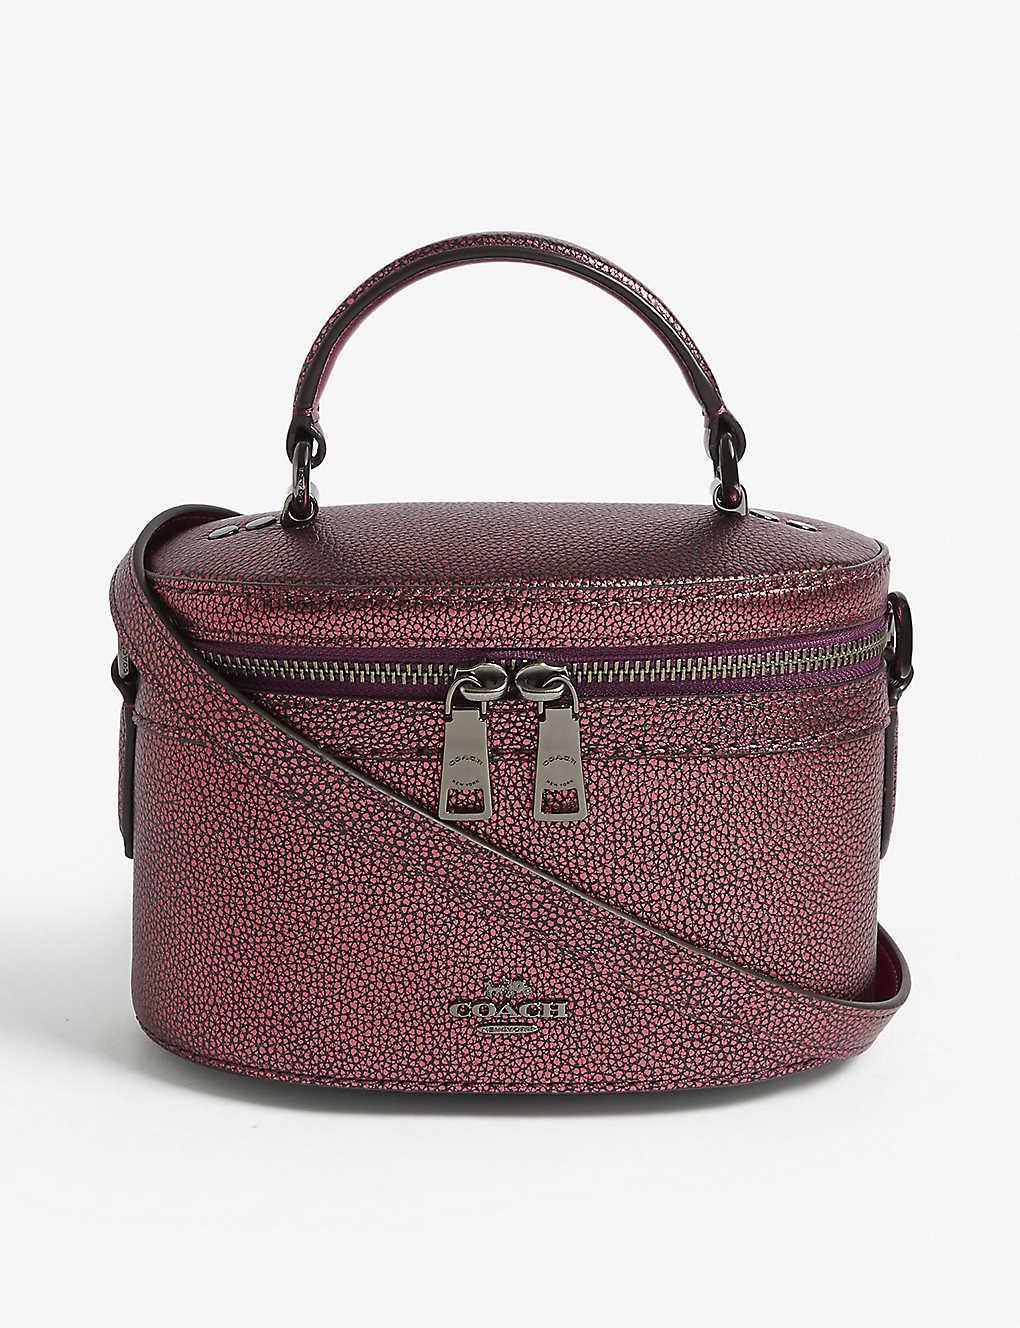 db25f5b46 COACH - Trail metallic leather cross-body bag | Selfridges.com